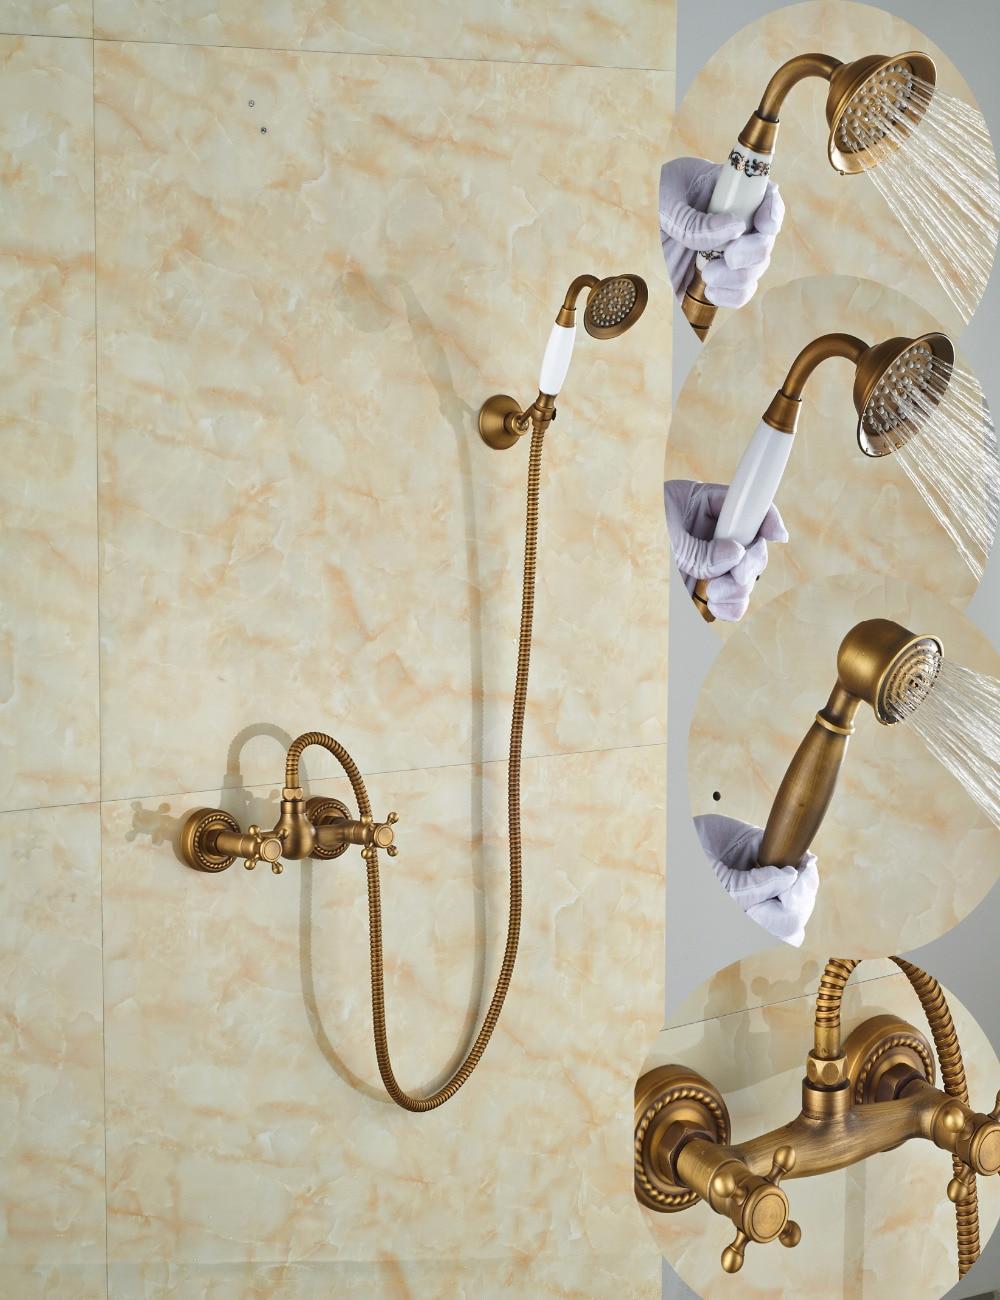 Wholesale And Retail Promotion Antique Brass Bathroom Rain Shower Faucet Dual Cross Handles Hand Held Shower Sprayer dual cross handles antique brass bathroom tub faucet with hand held shower sprayer